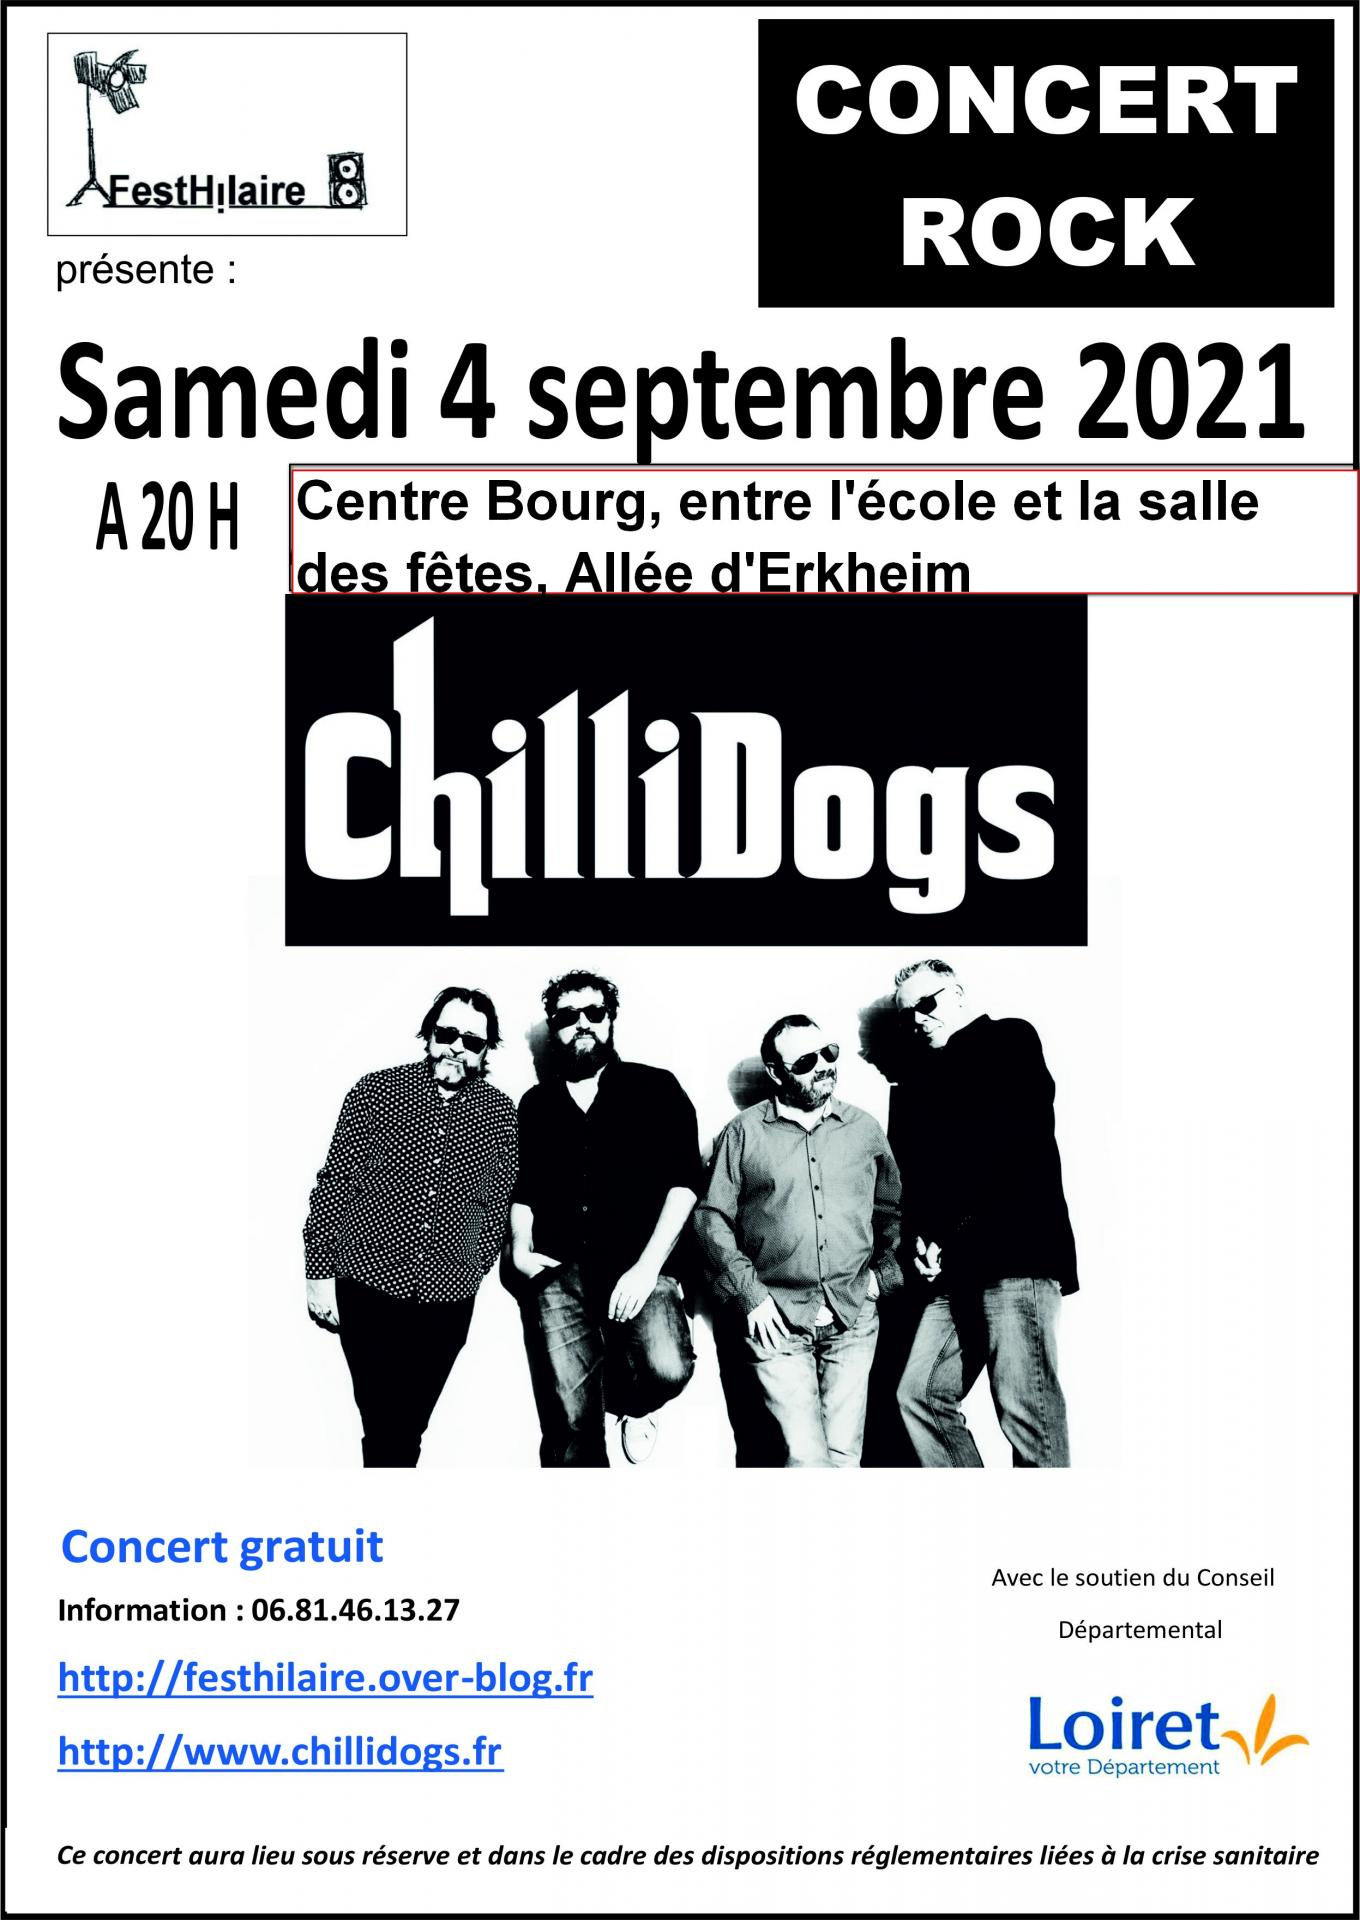 Festhilaire chillidogs 2022